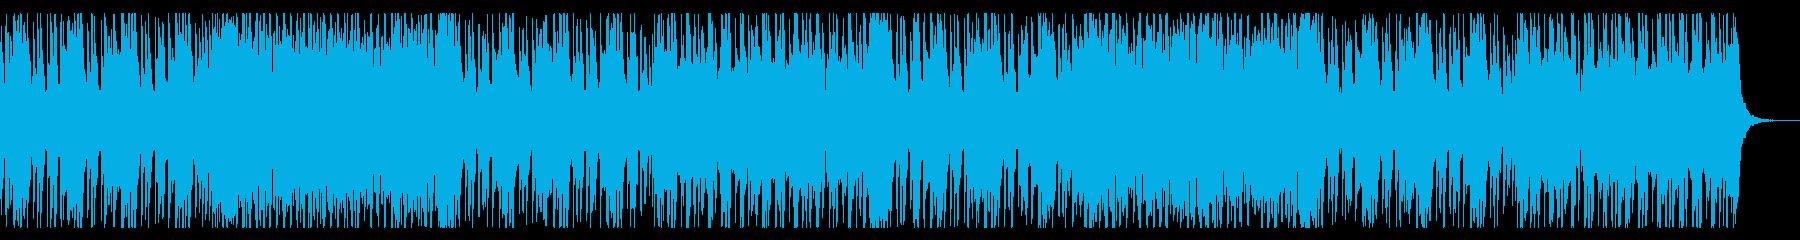 Spooky80Drumの再生済みの波形